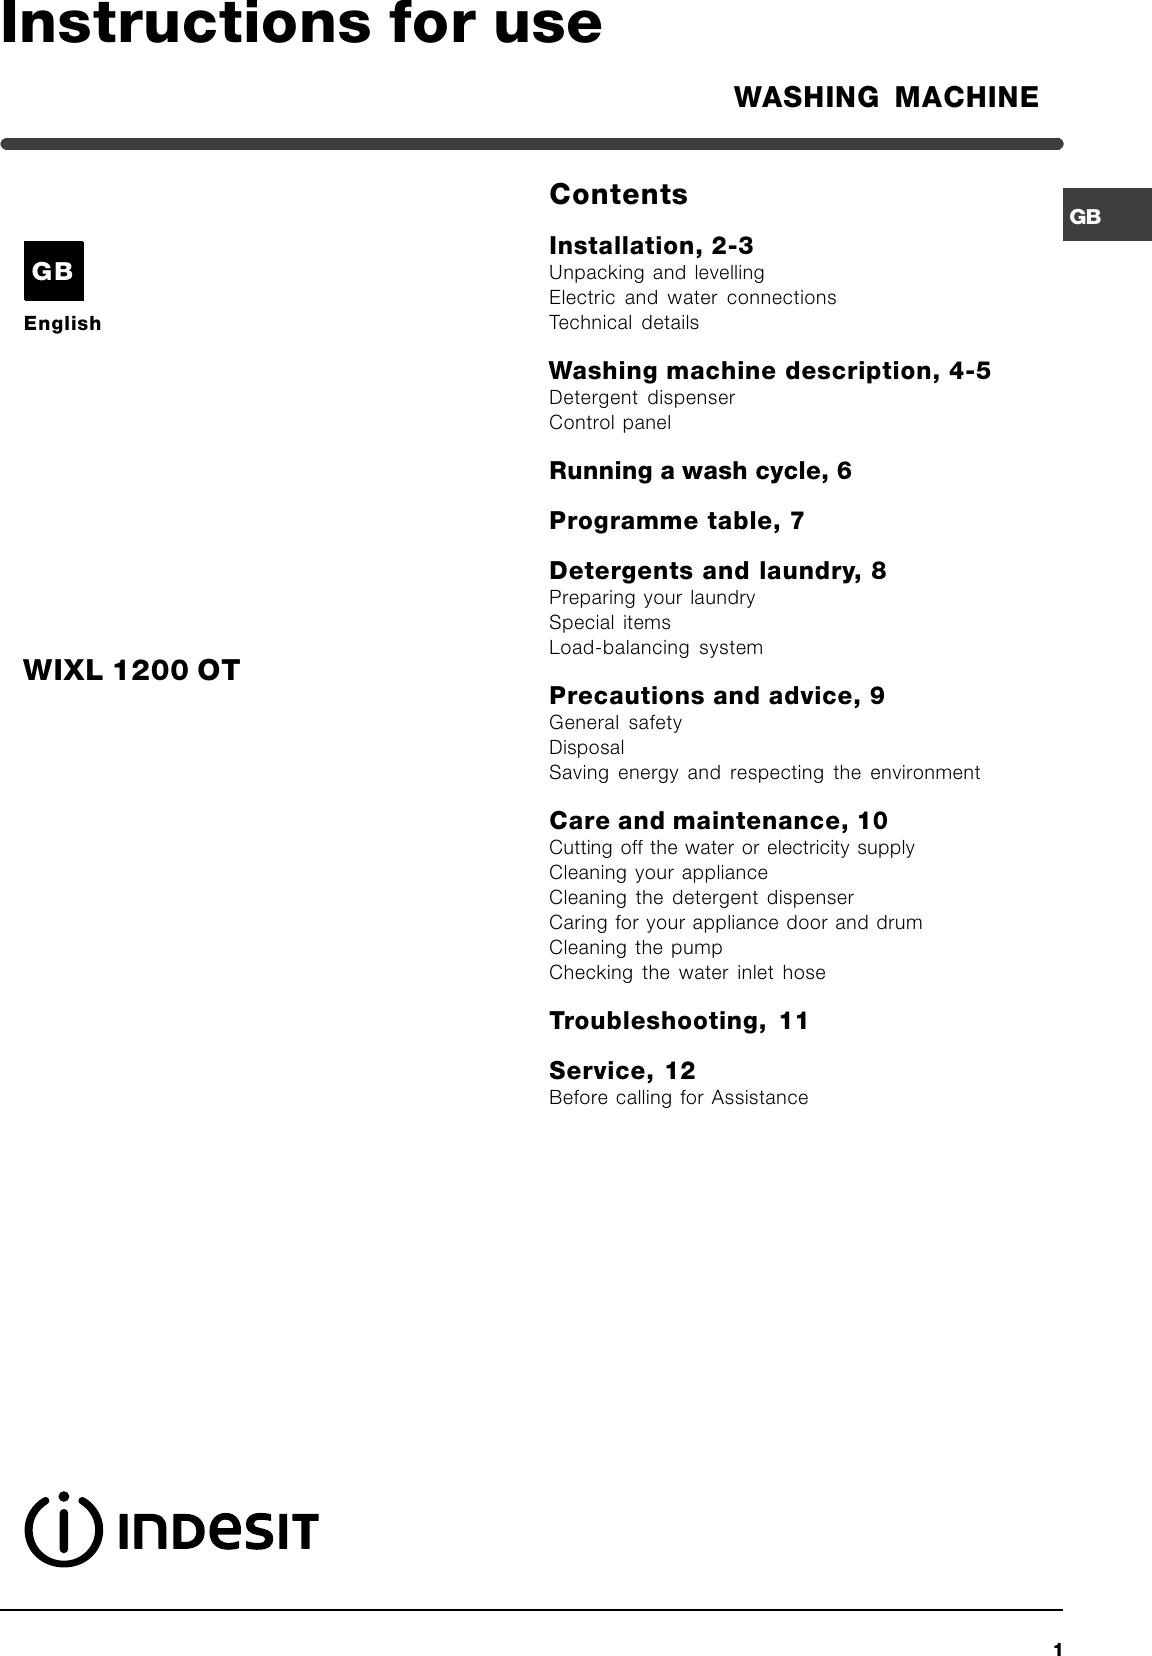 Indesit Washing Machine Wixl 1200 Ot Instruction Manual GB_WIXL ...